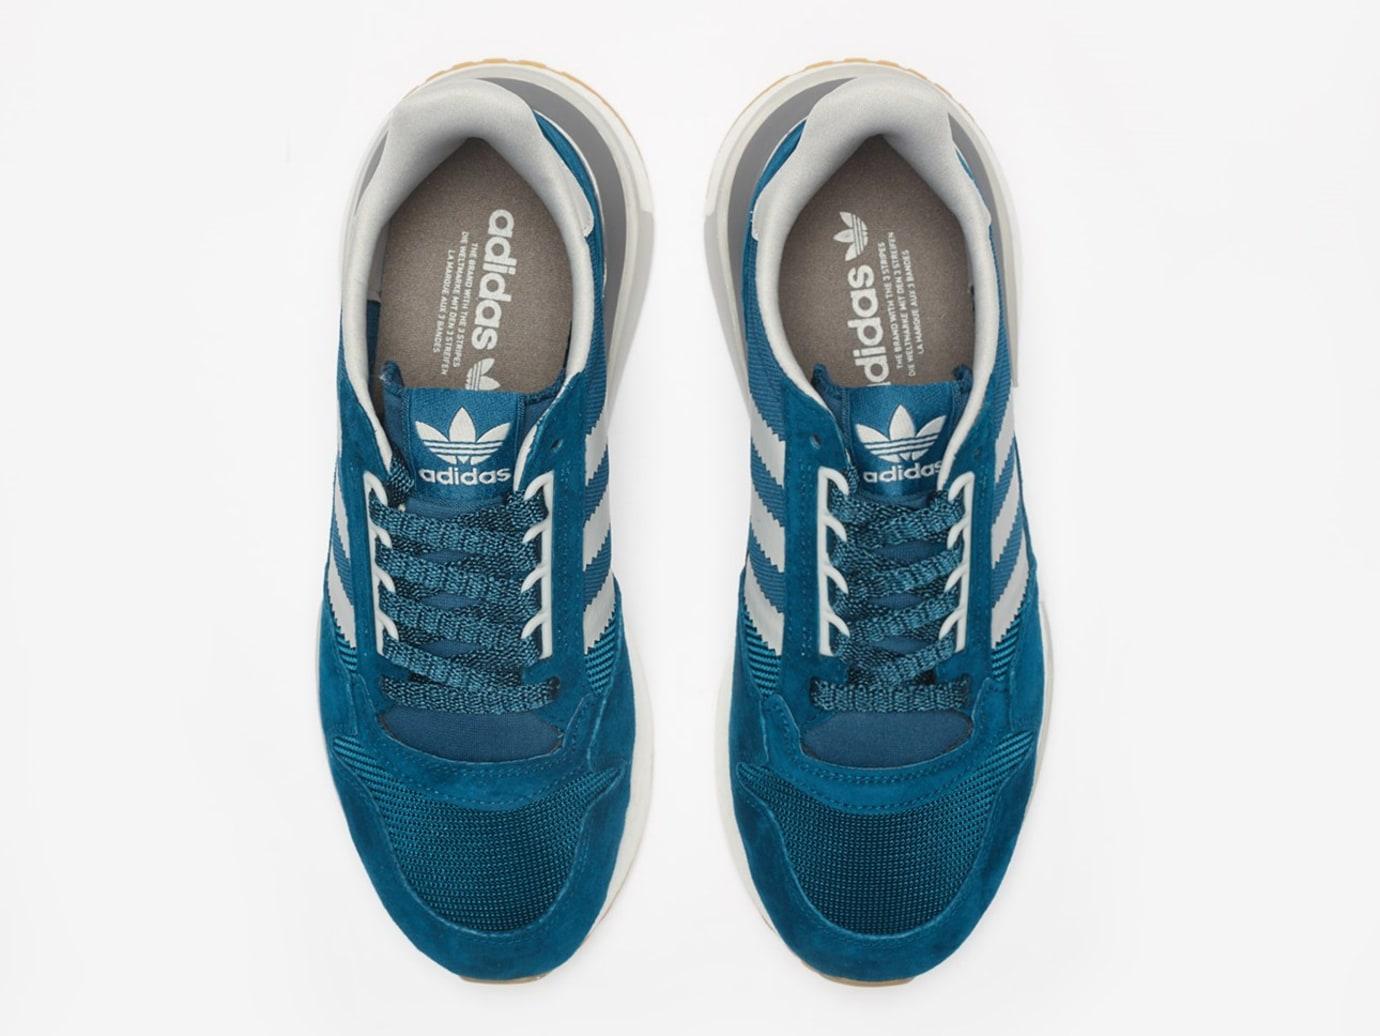 bfb064fcda3f5 Image via Sneakersnstuff Sneakersnstuff x Adidas Originals ZX 500 RM F36882  Release Date